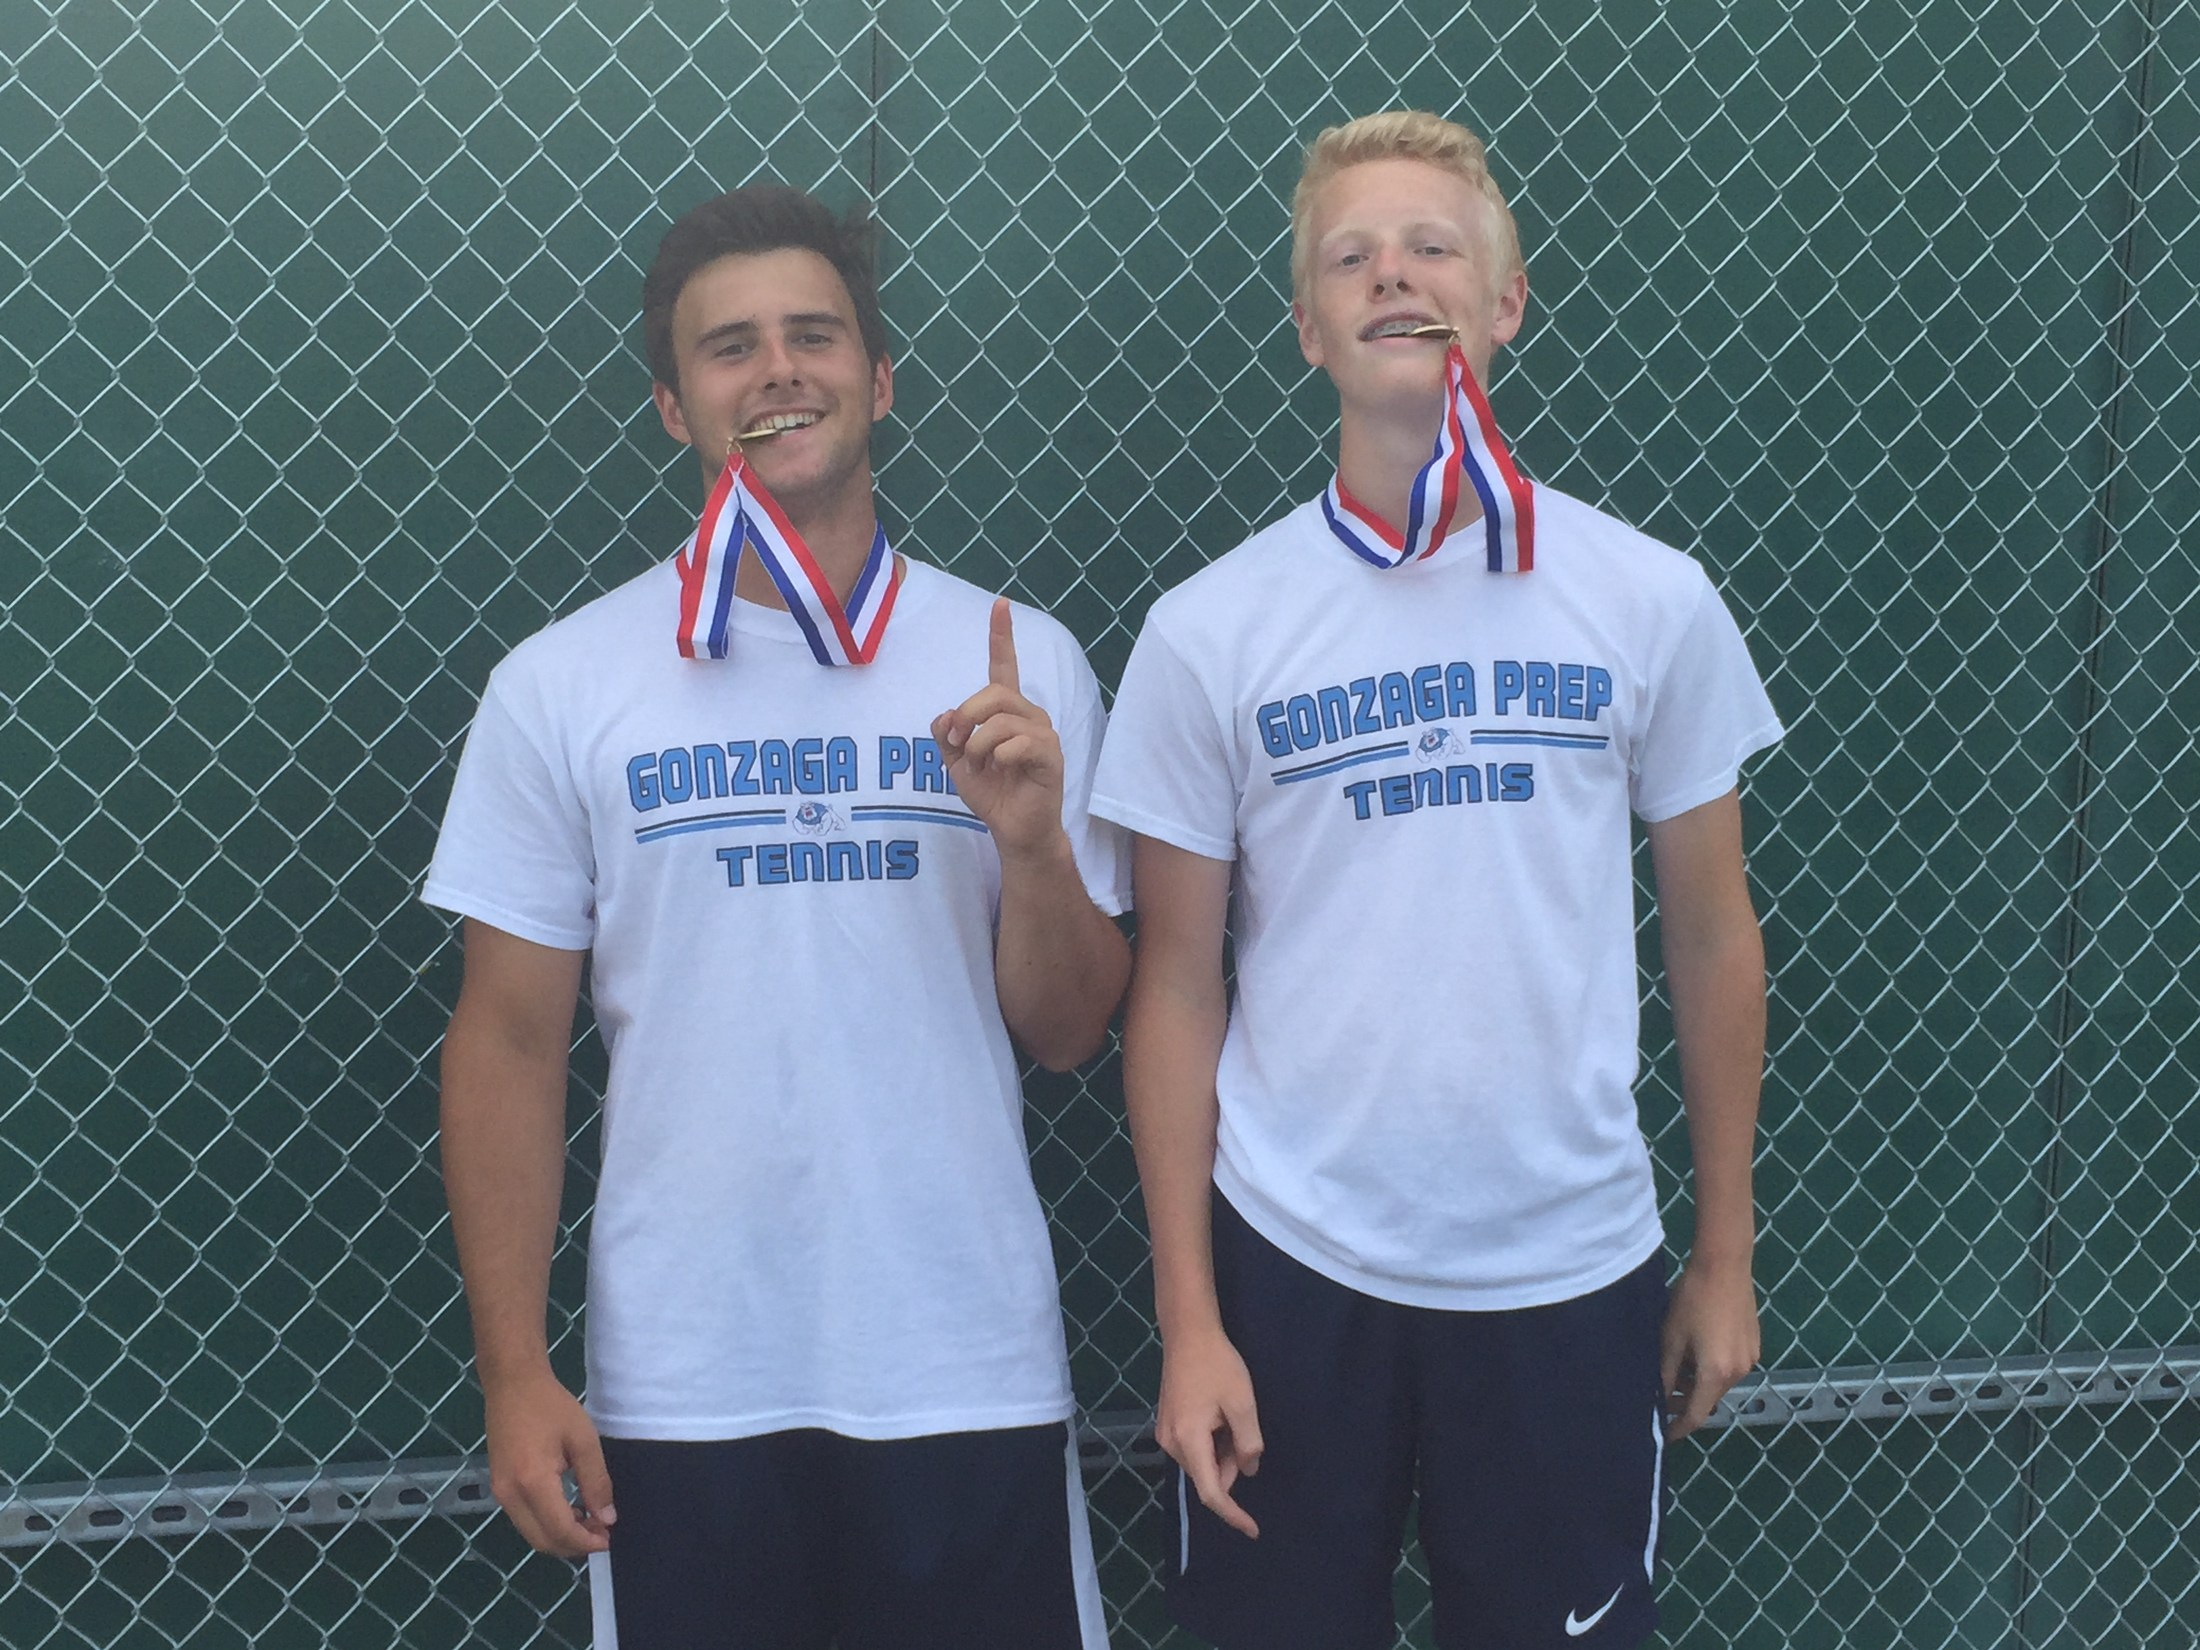 Boys Tennis - District Champions